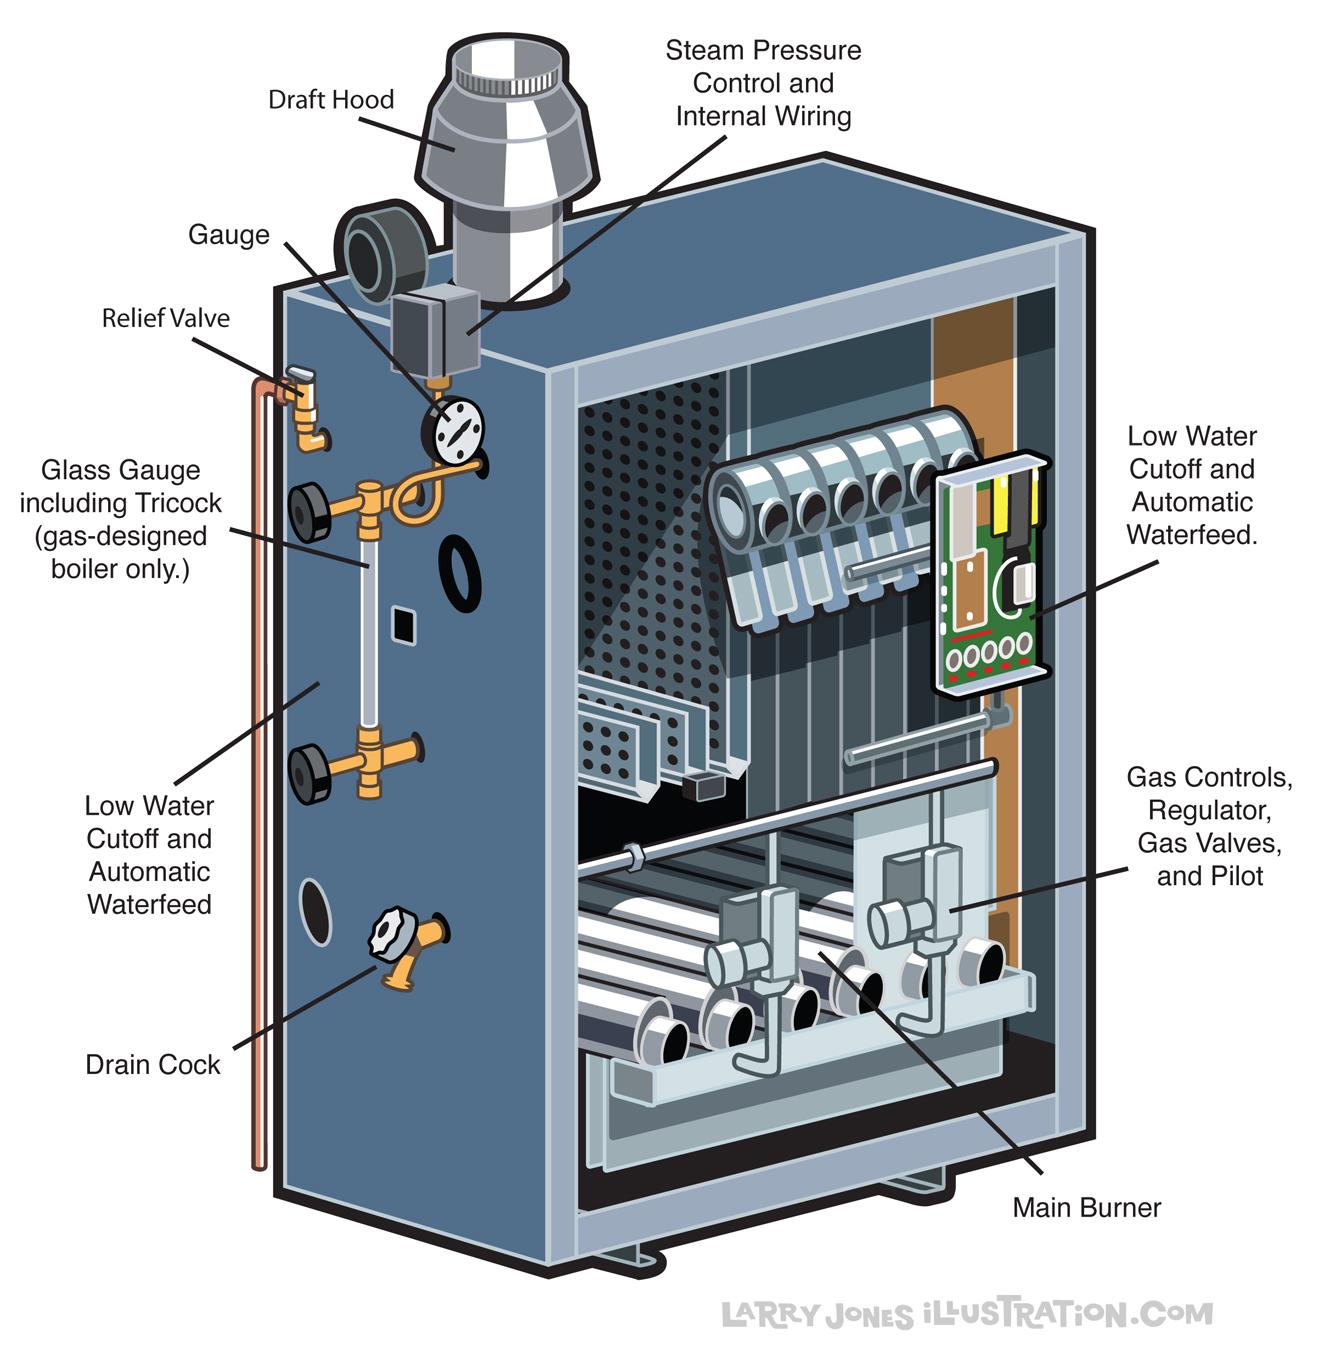 BGE-steam-gas-illustration.jpg